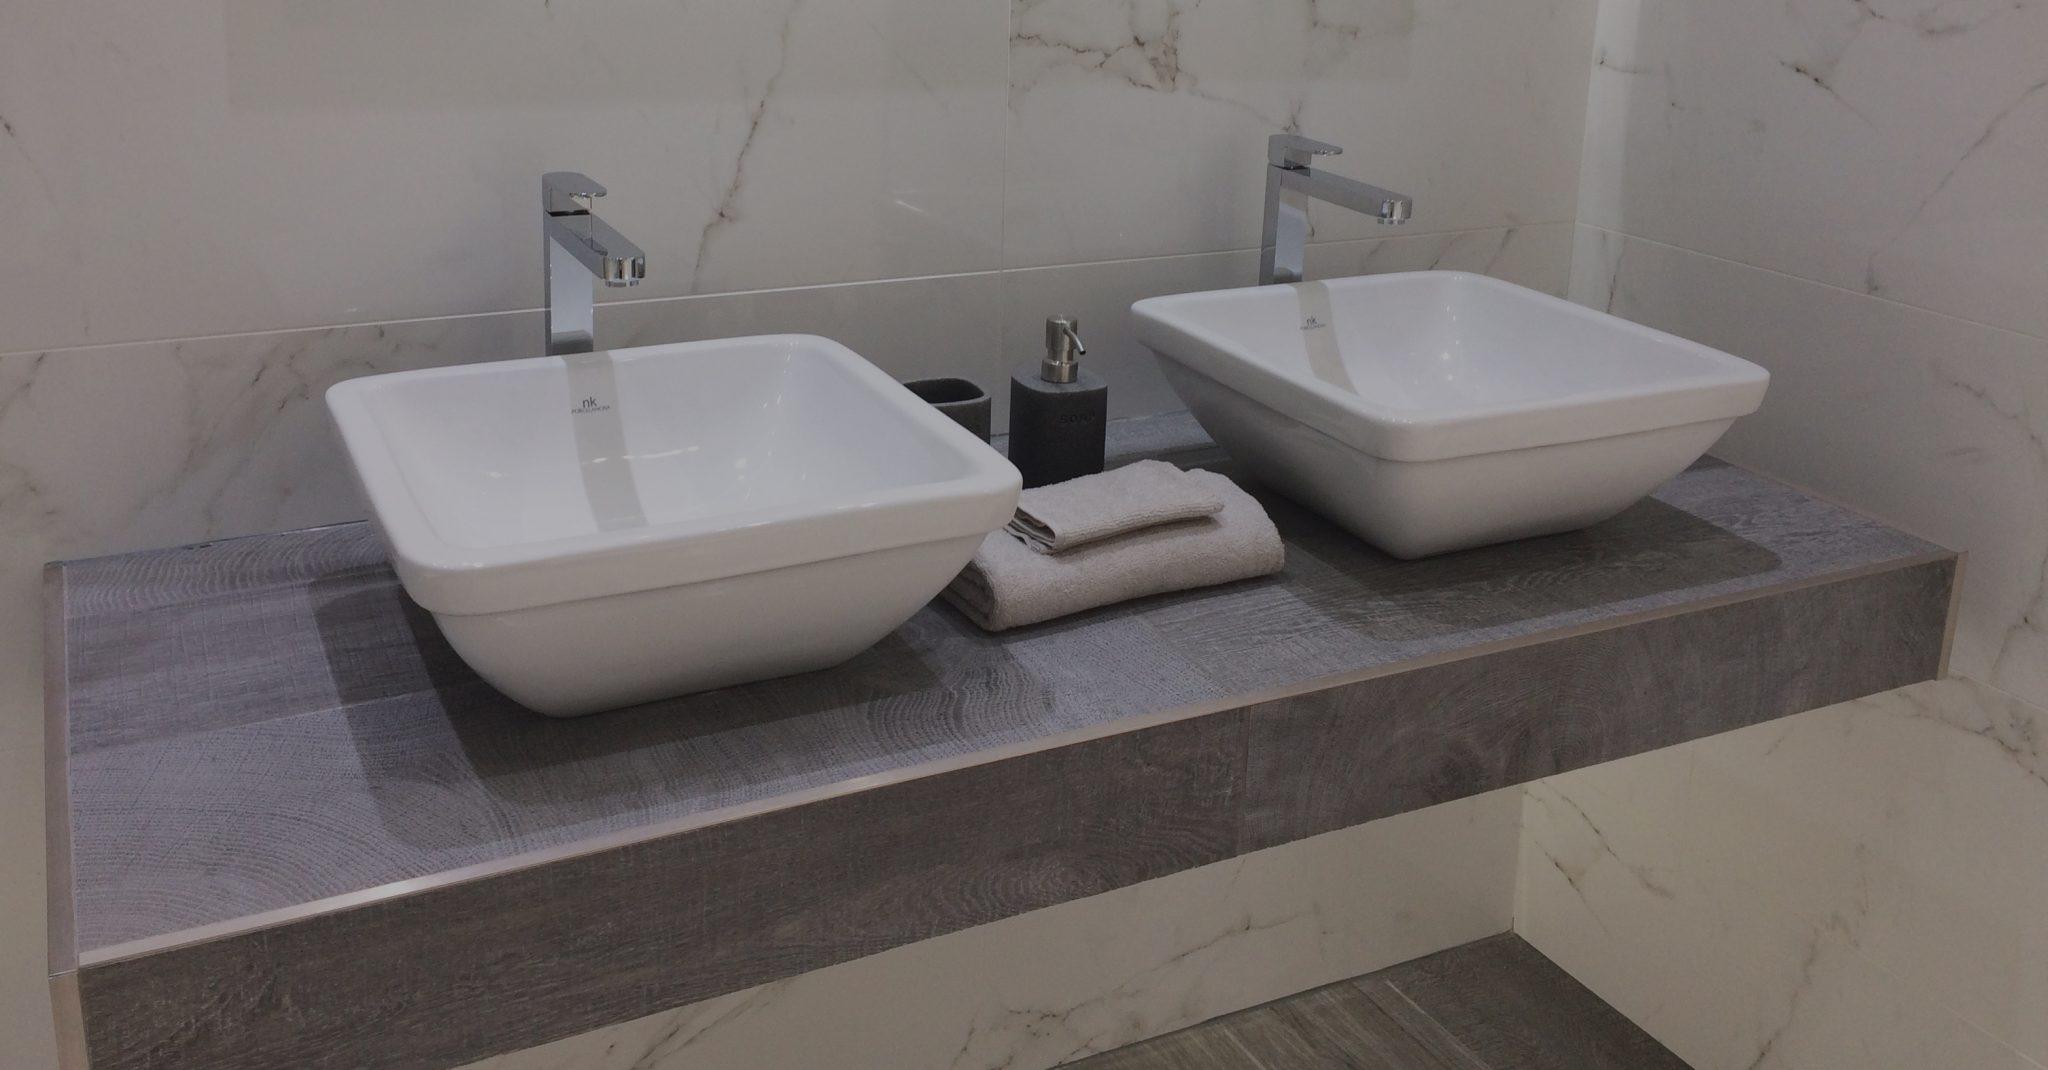 Porcelanosa dimension dmi kitchens bathrooms ayrshire for Porcelanosa bathrooms prices